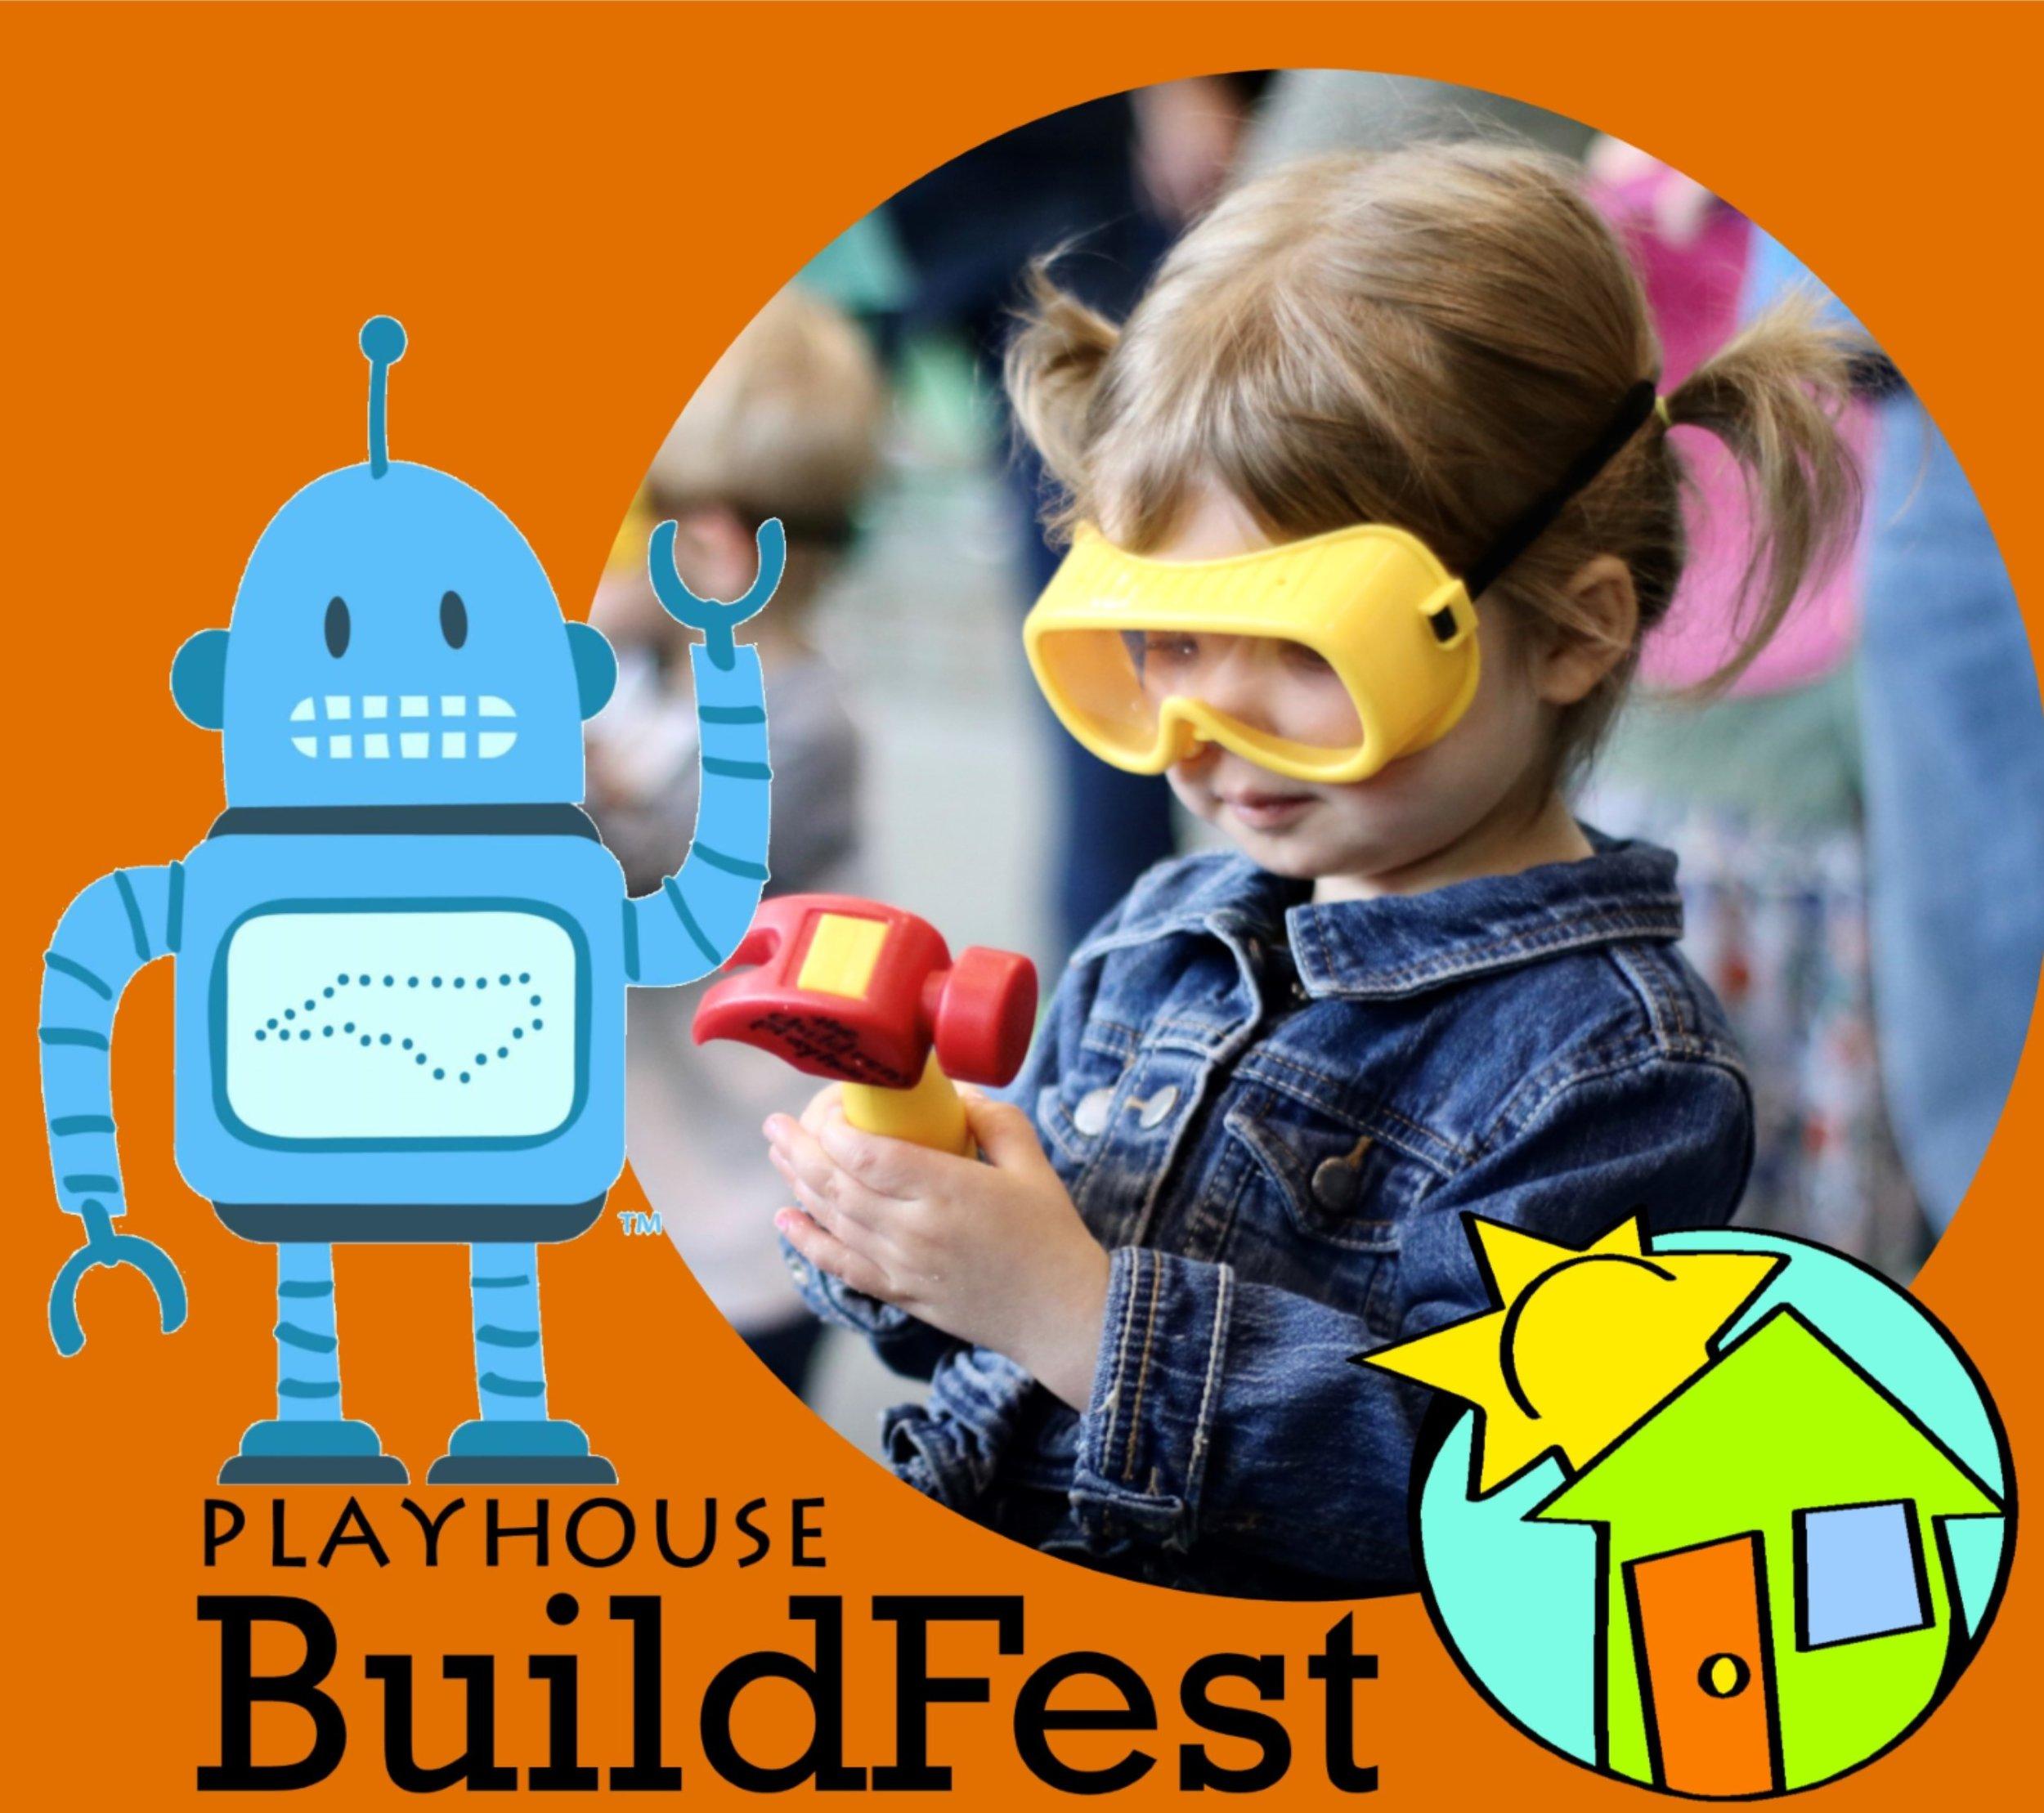 BuildFest 2019 square logo orange.jpg